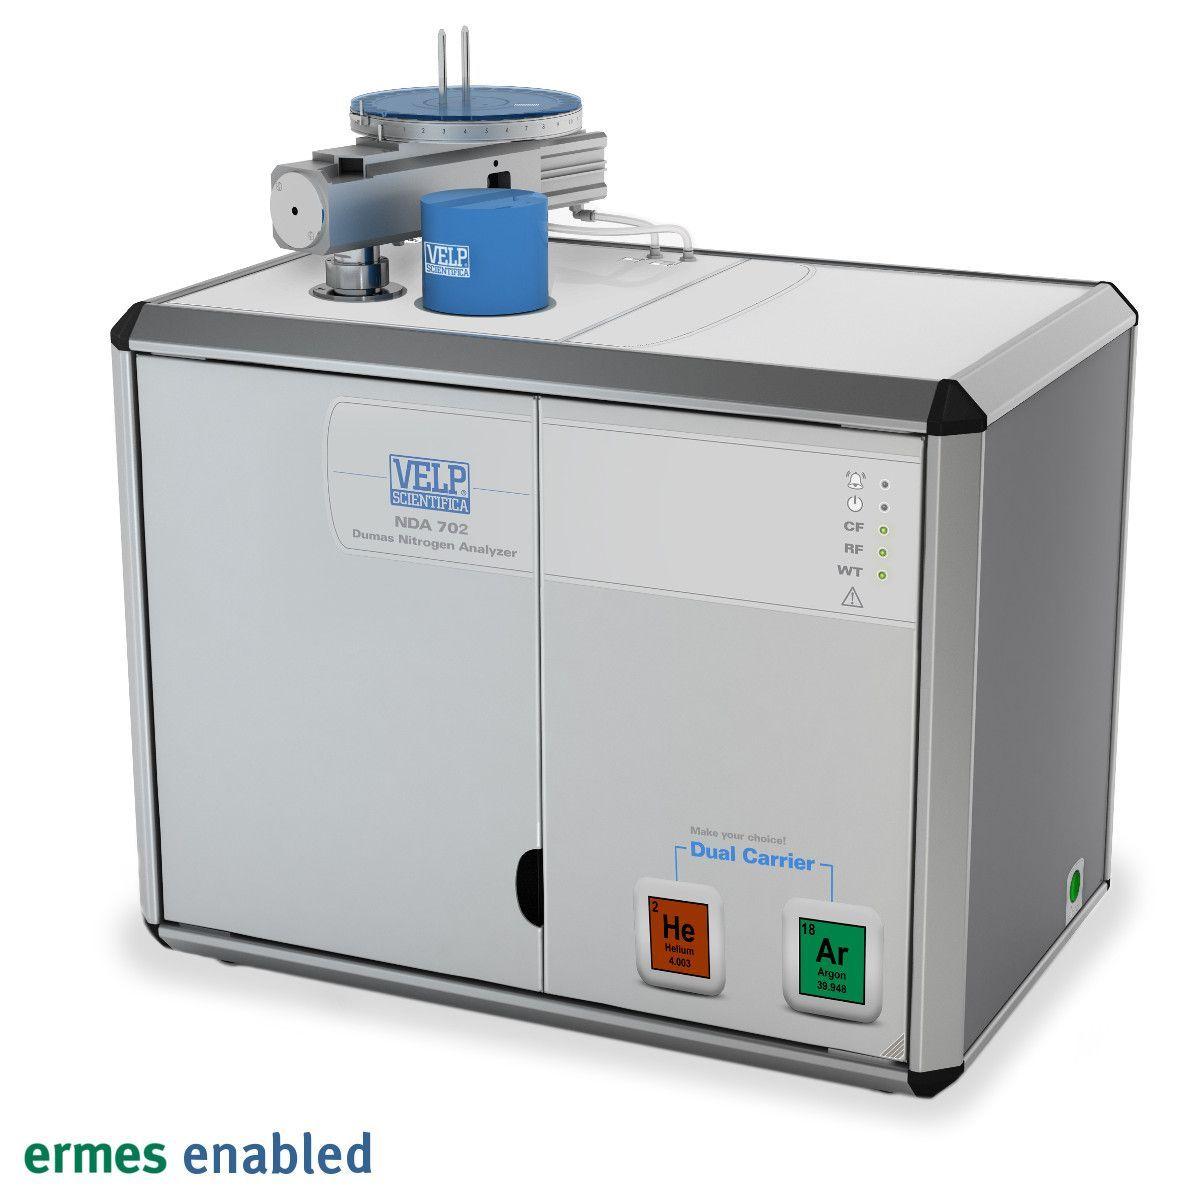 VELP Scientifica - NDA 702 Dual Carrier Gas Dumas Nitrogen Analyzer